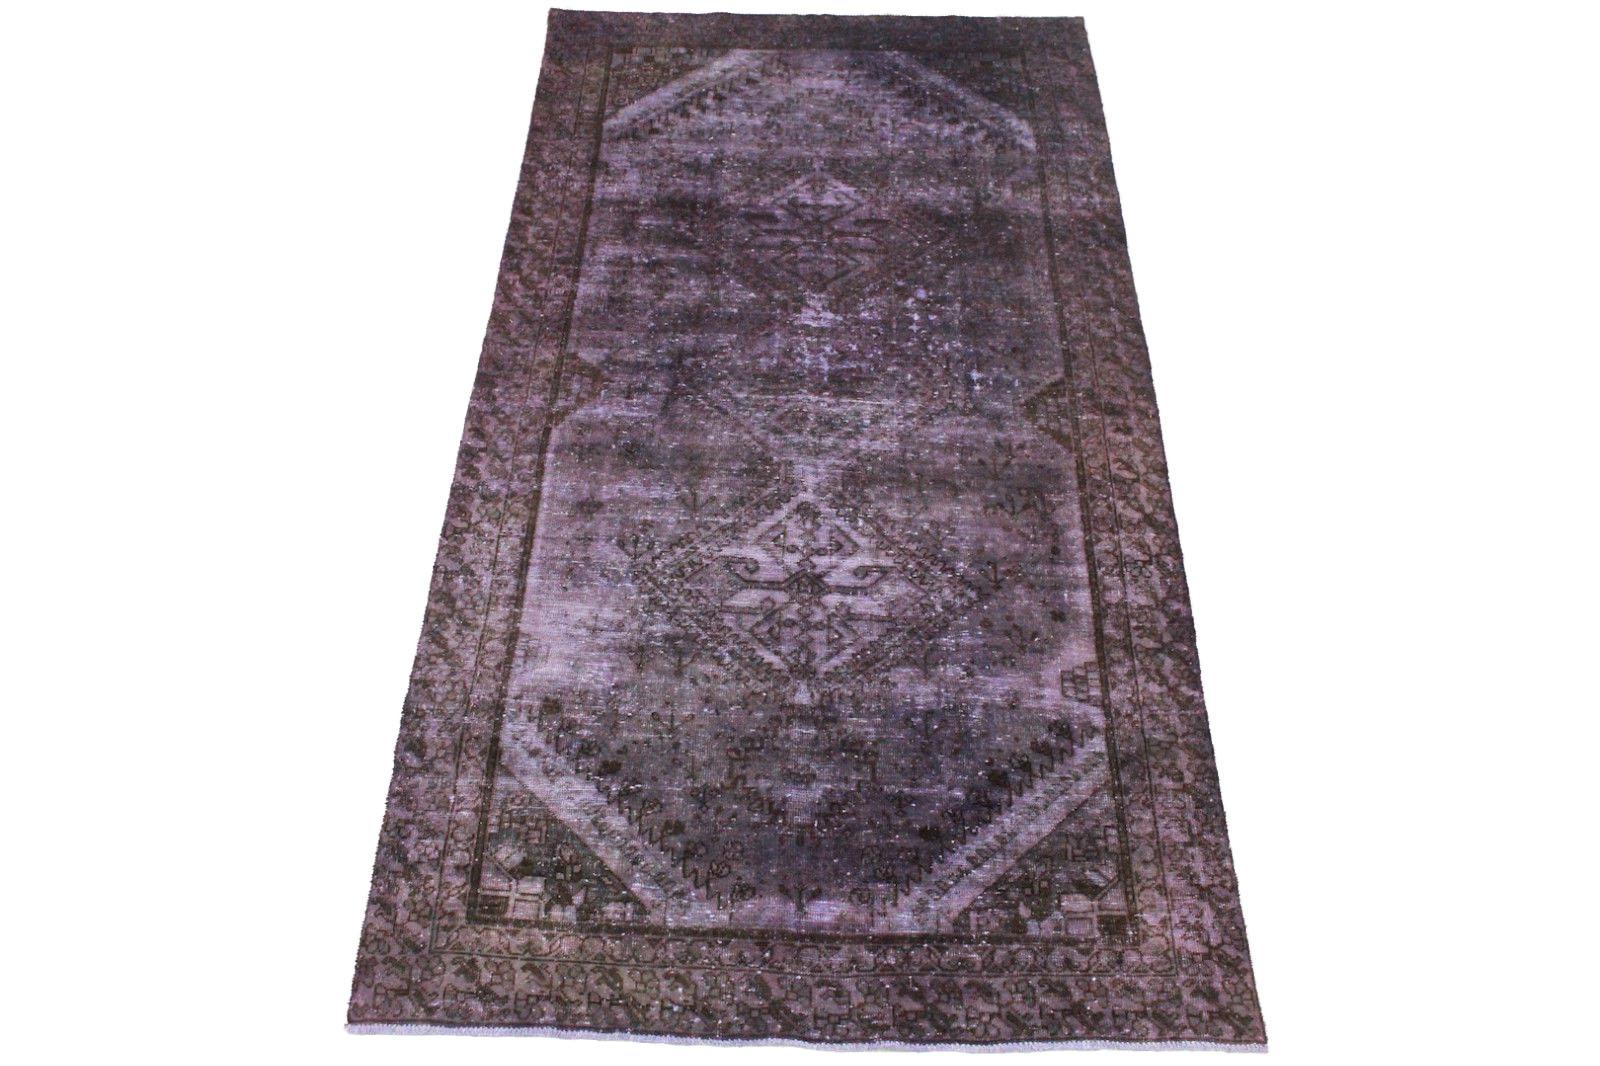 vintage teppich lila in 290x150cm 1001 3288 bei kaufen. Black Bedroom Furniture Sets. Home Design Ideas